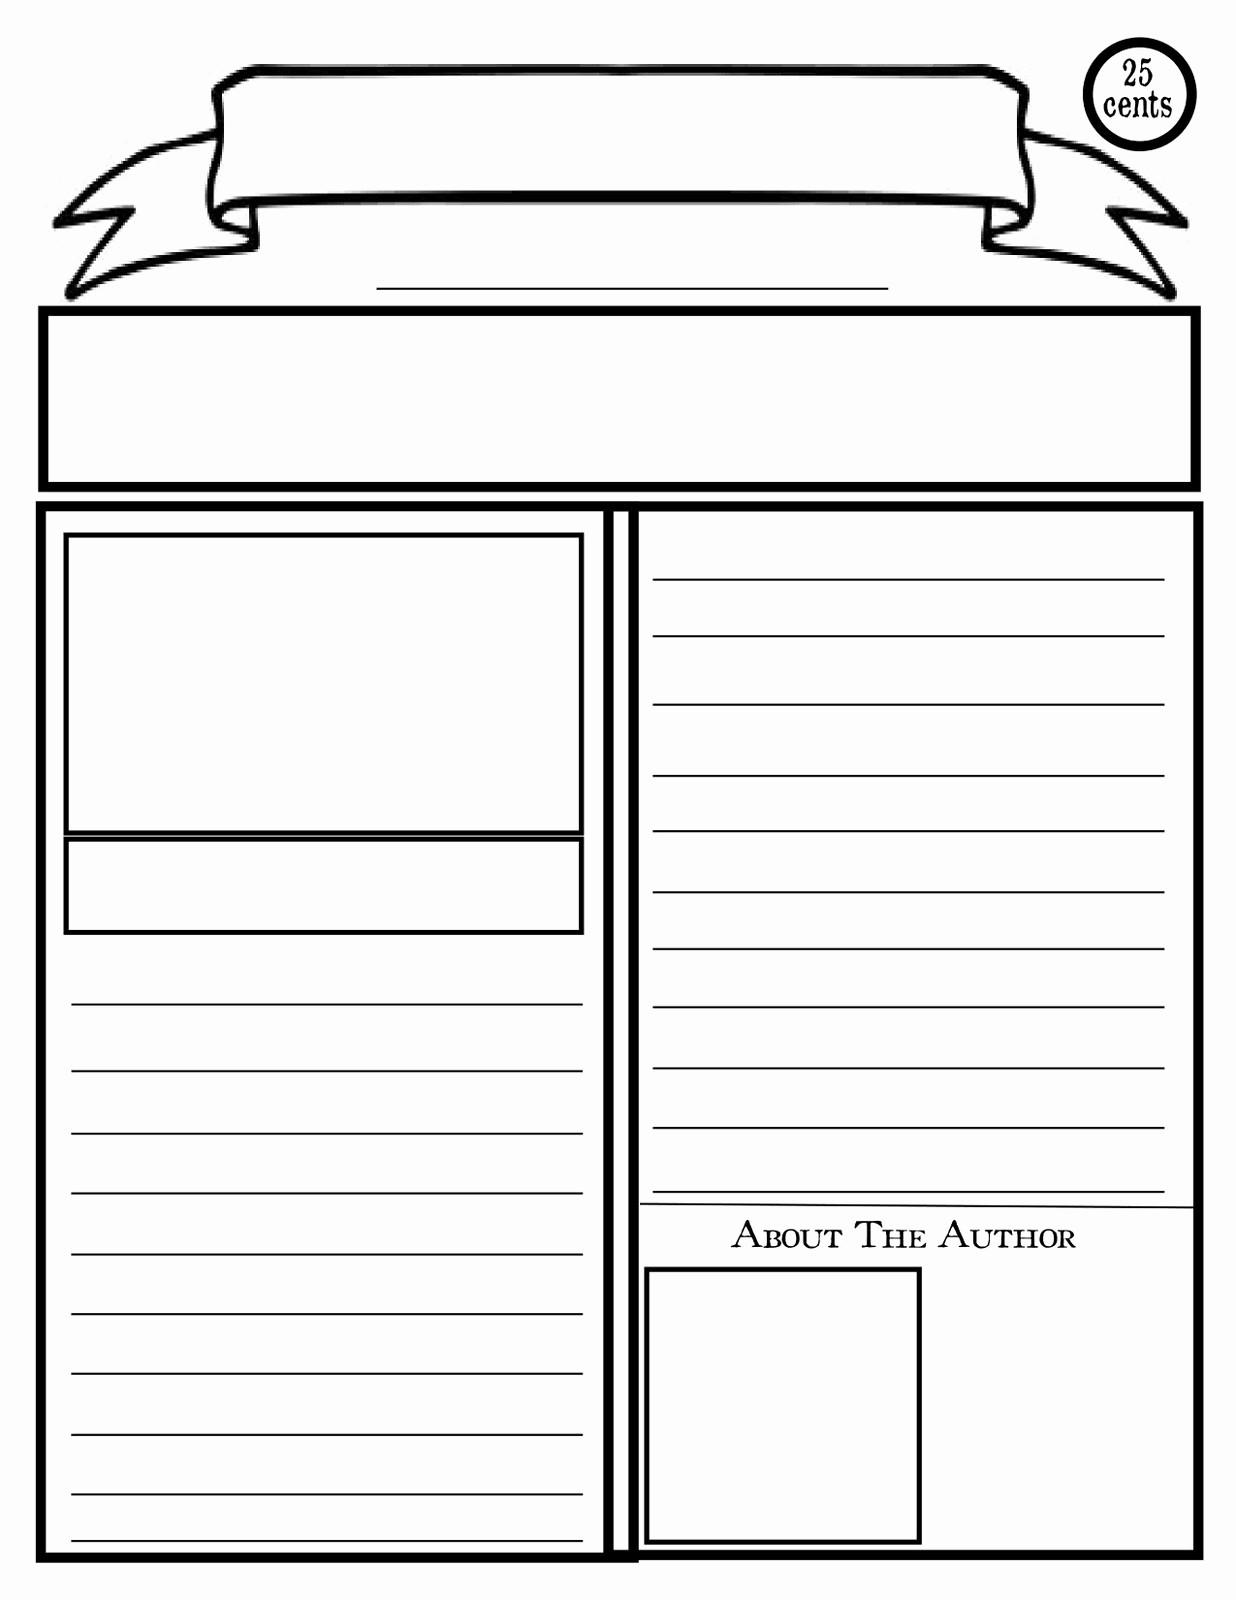 Free Microsoft Word Newspaper Template Inspirational Blank Newspaper Clipart